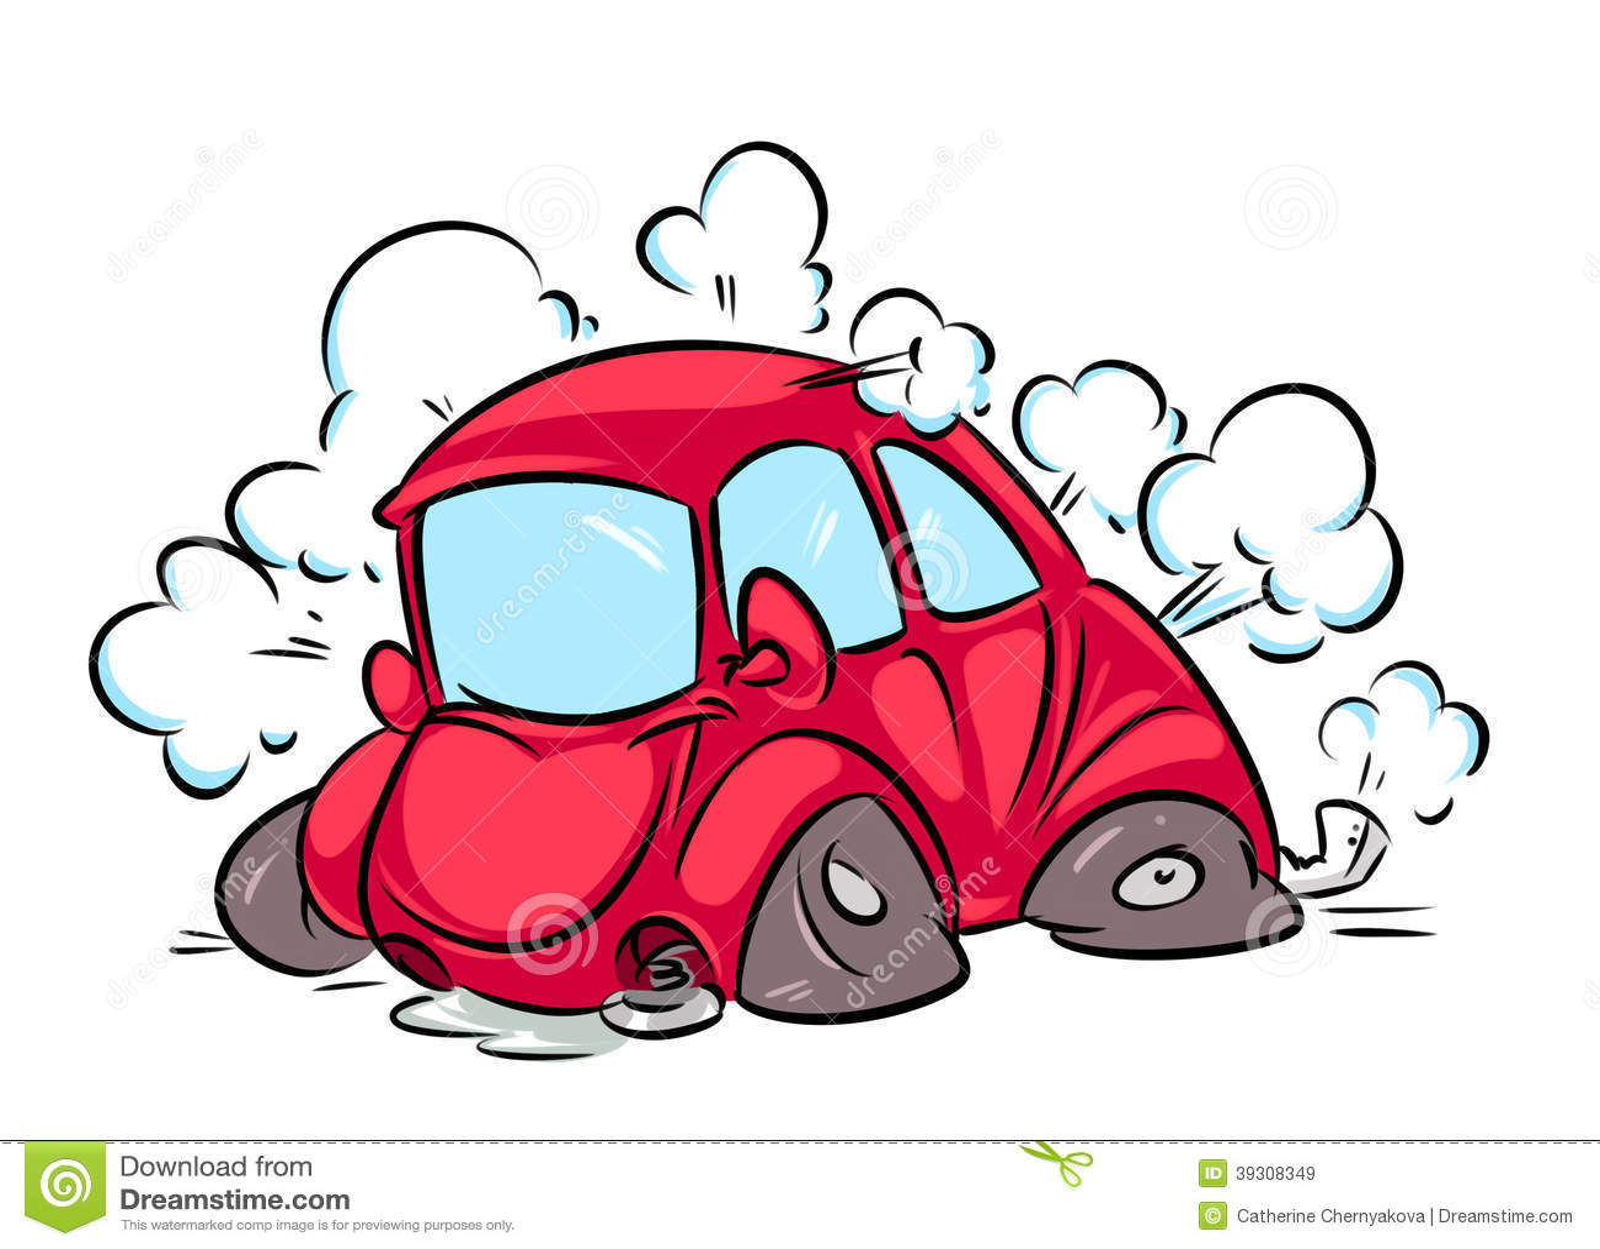 Car Crash Royalty Free Cliparts, Vectors, And Stock Illustration. Image  37054370.